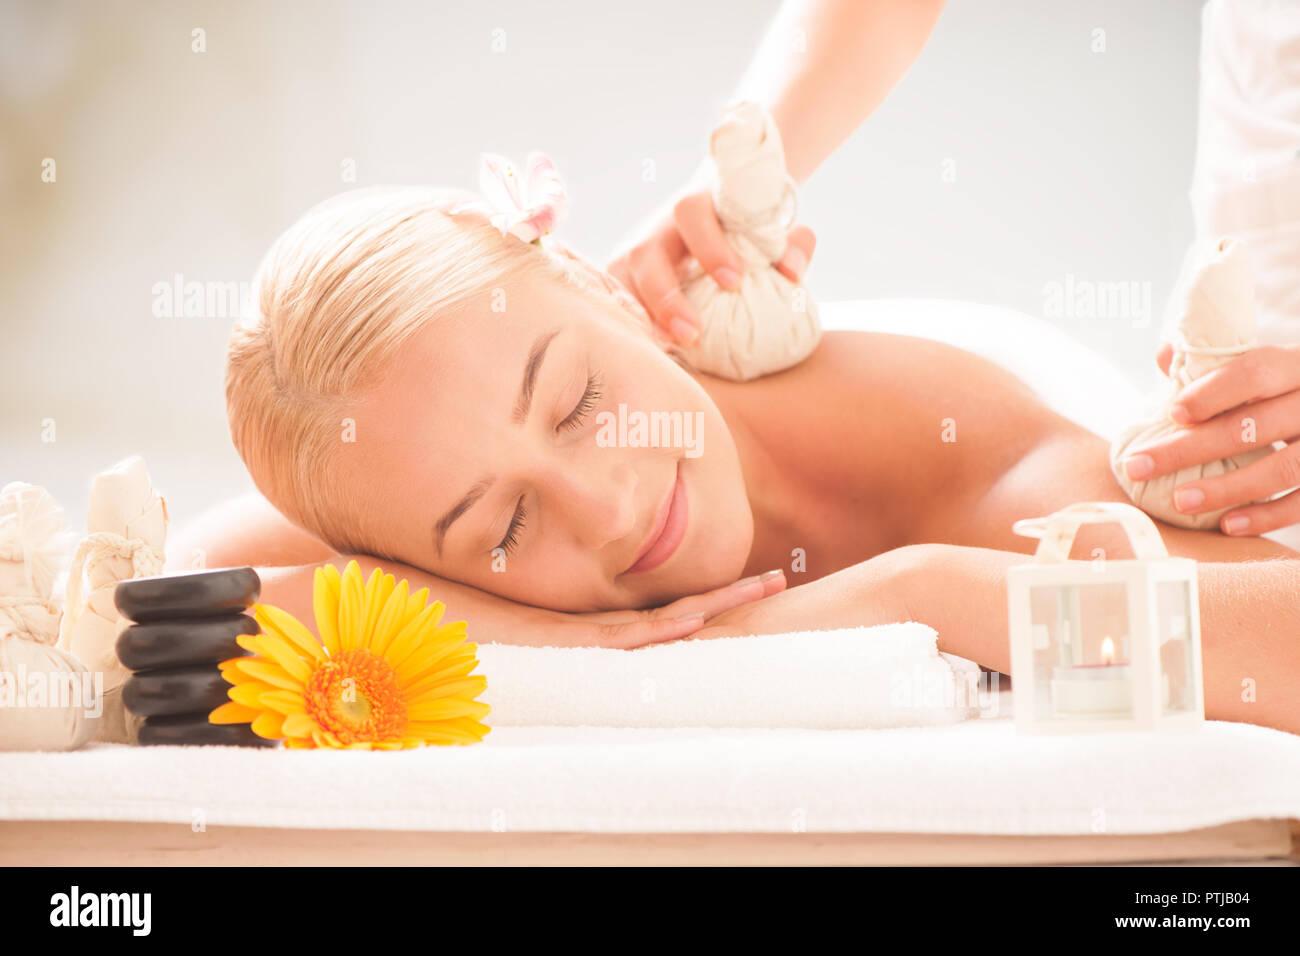 Blonde lady enjoying massages at health spa - Stock Image